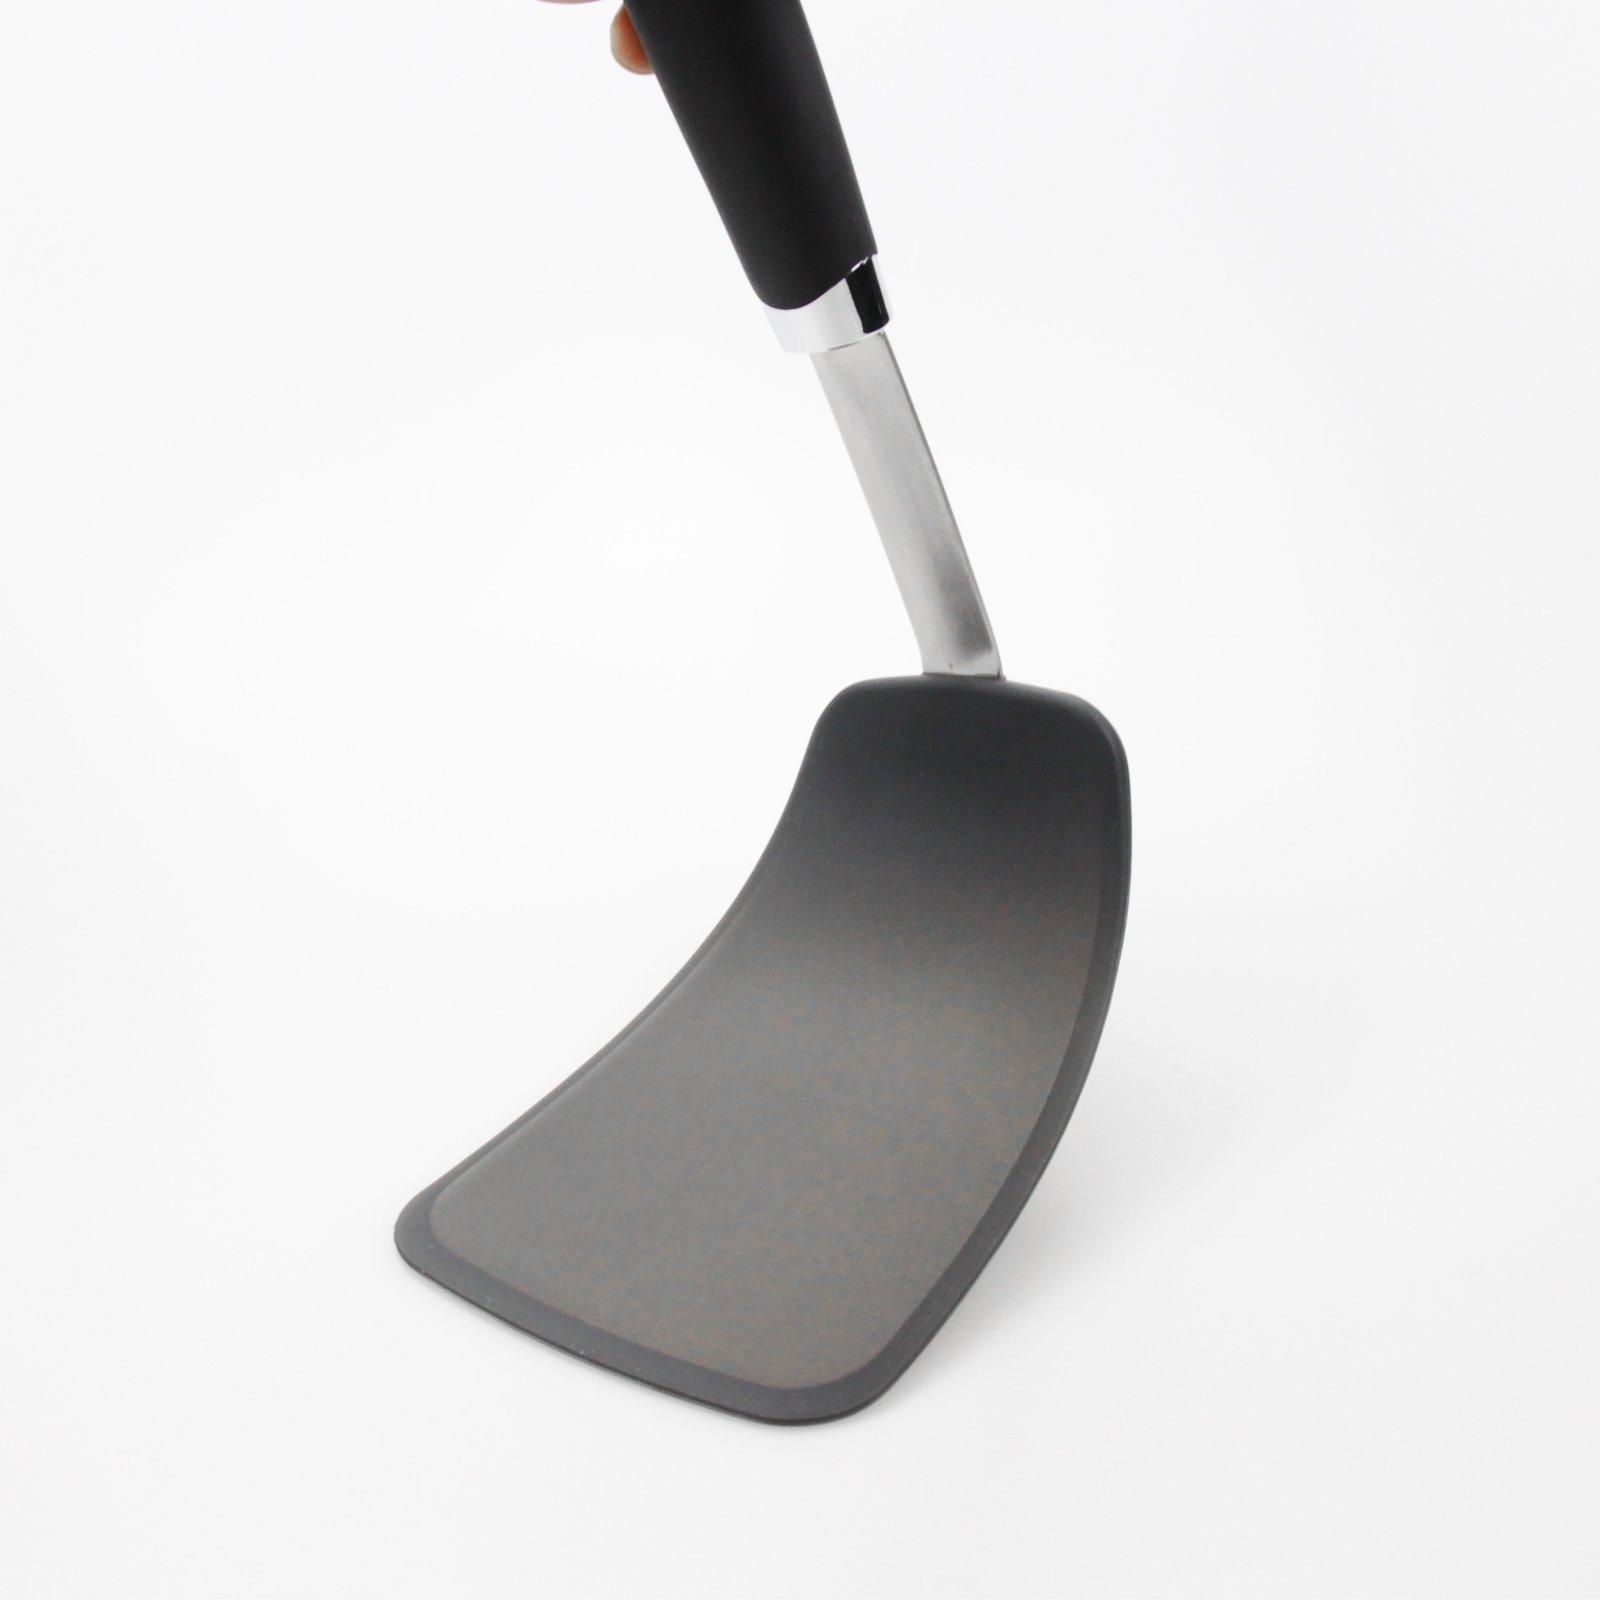 Hygienic Solid Heat-Resistant Flexible Silicone Spatula, Black Non-stick Silicone Turner by ALLWIN-HOUSEWARE W (Image #2)